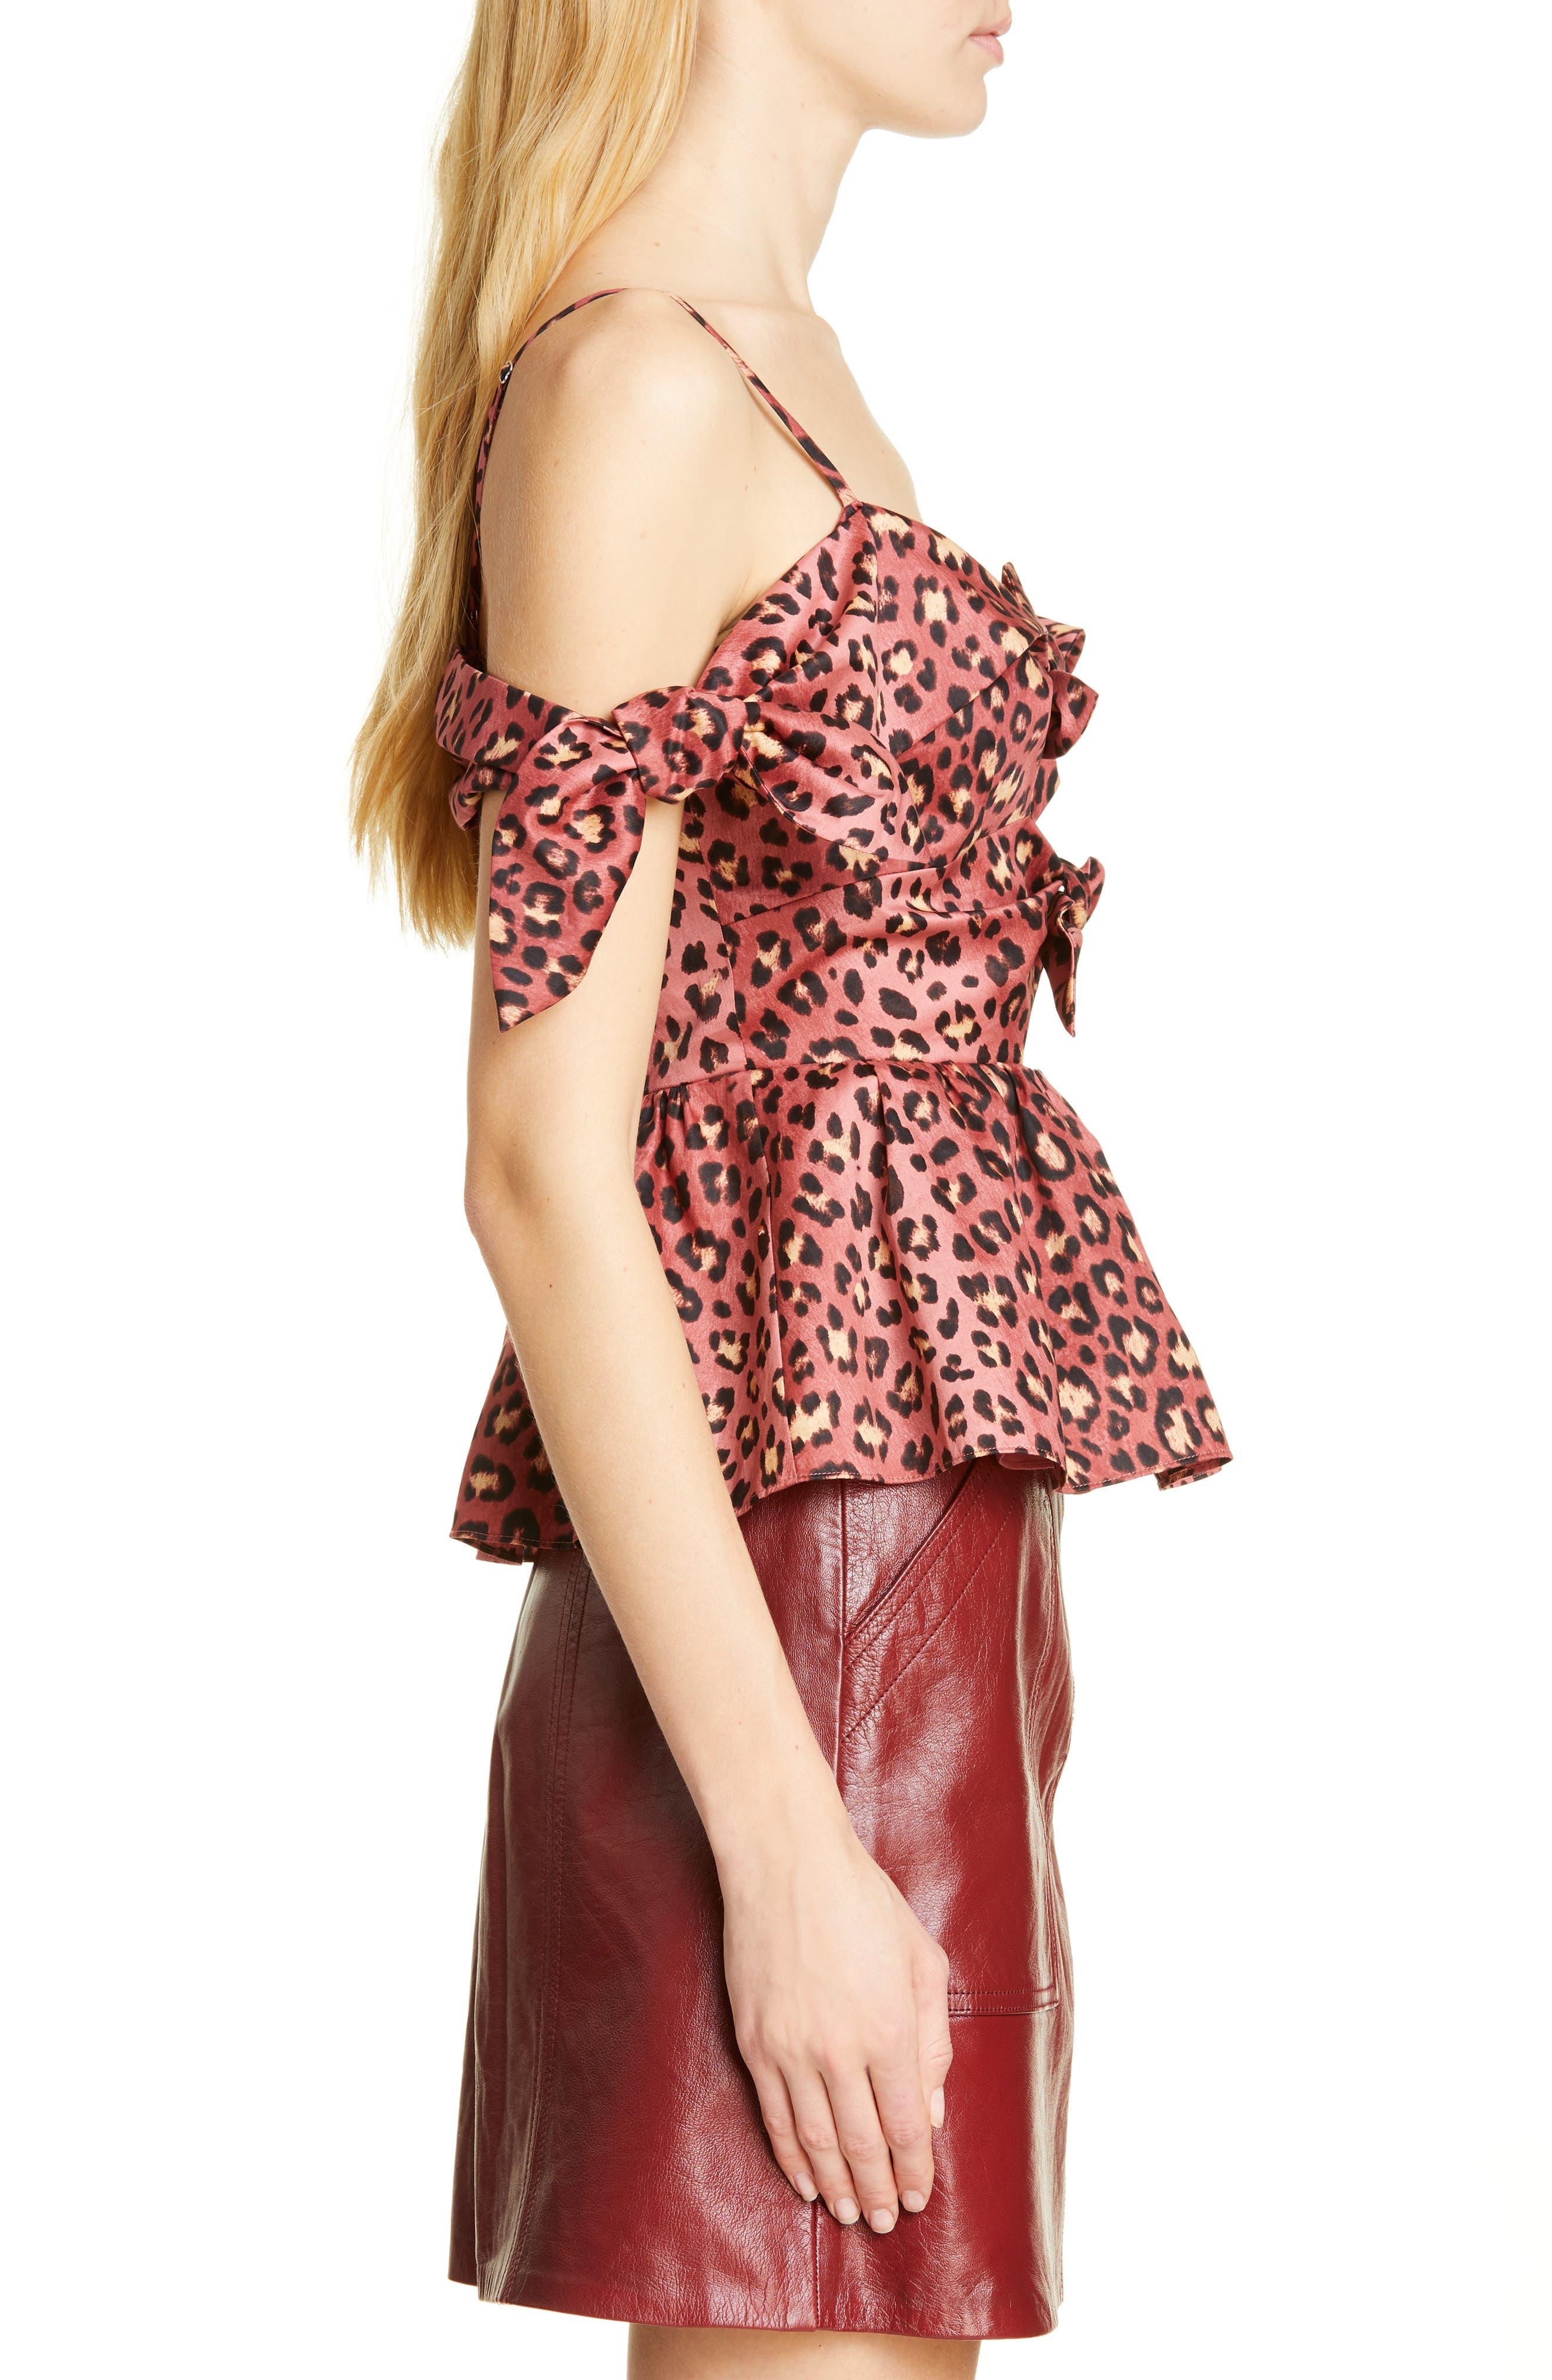 REBECCA TAYLOR, Bow Detail Leopard Print Cold Shoulder Cotton Blouse, Alternate thumbnail 3, color, HENNA